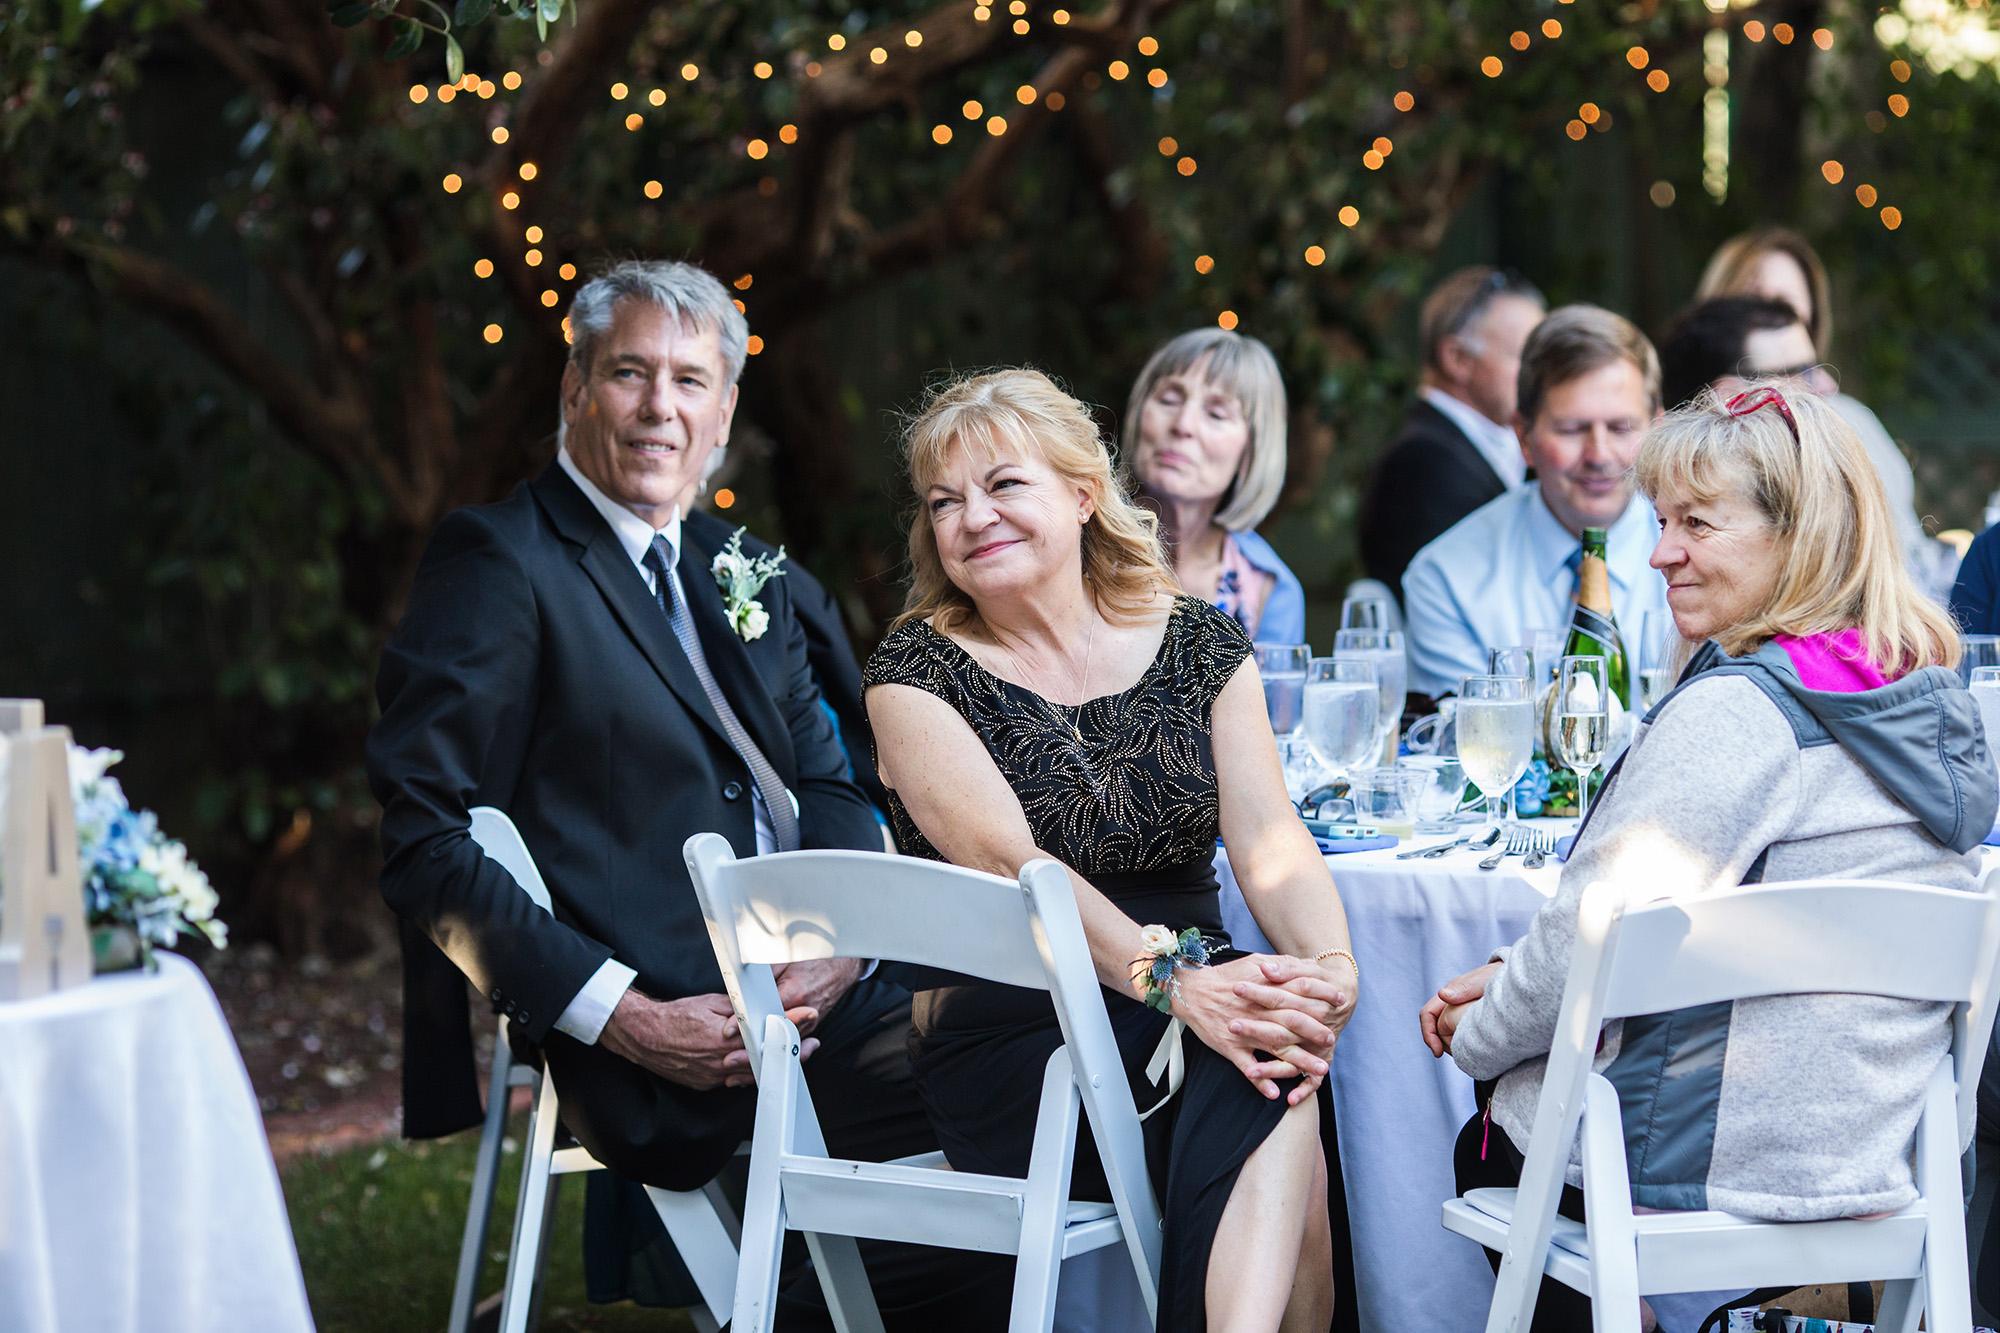 associate-photographer-christmas-house-wedding-carrie-vines-0054.jpg